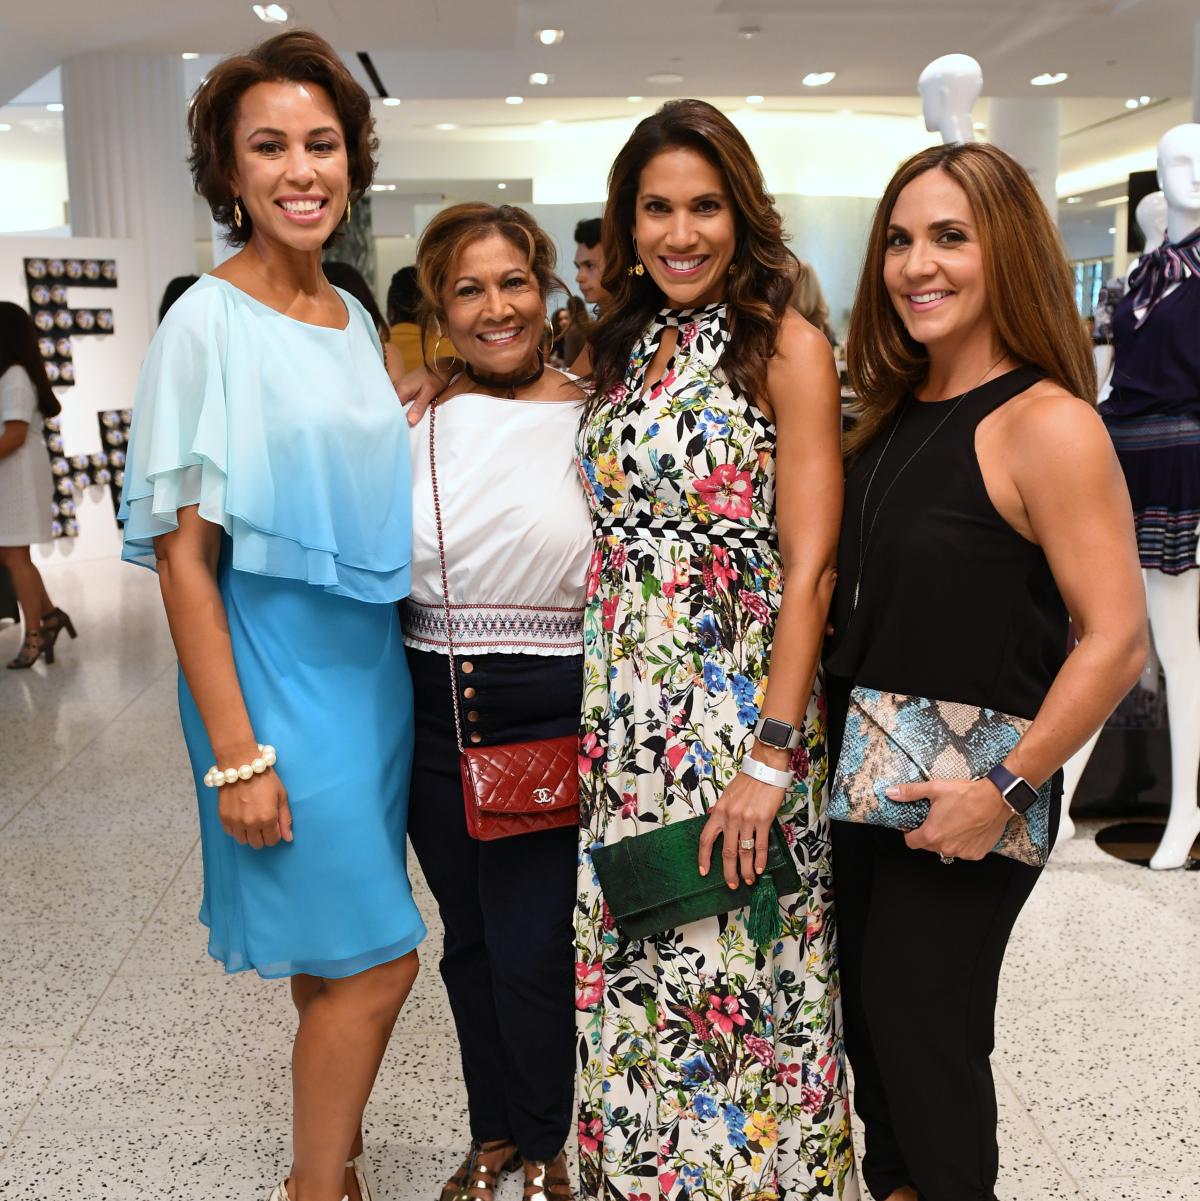 Houston, Women of Wardrobe Summer Soiree, August 2017, Dr. Crystal Wright, Monica McNeill, Rachel McNeill, Courtney Zavala